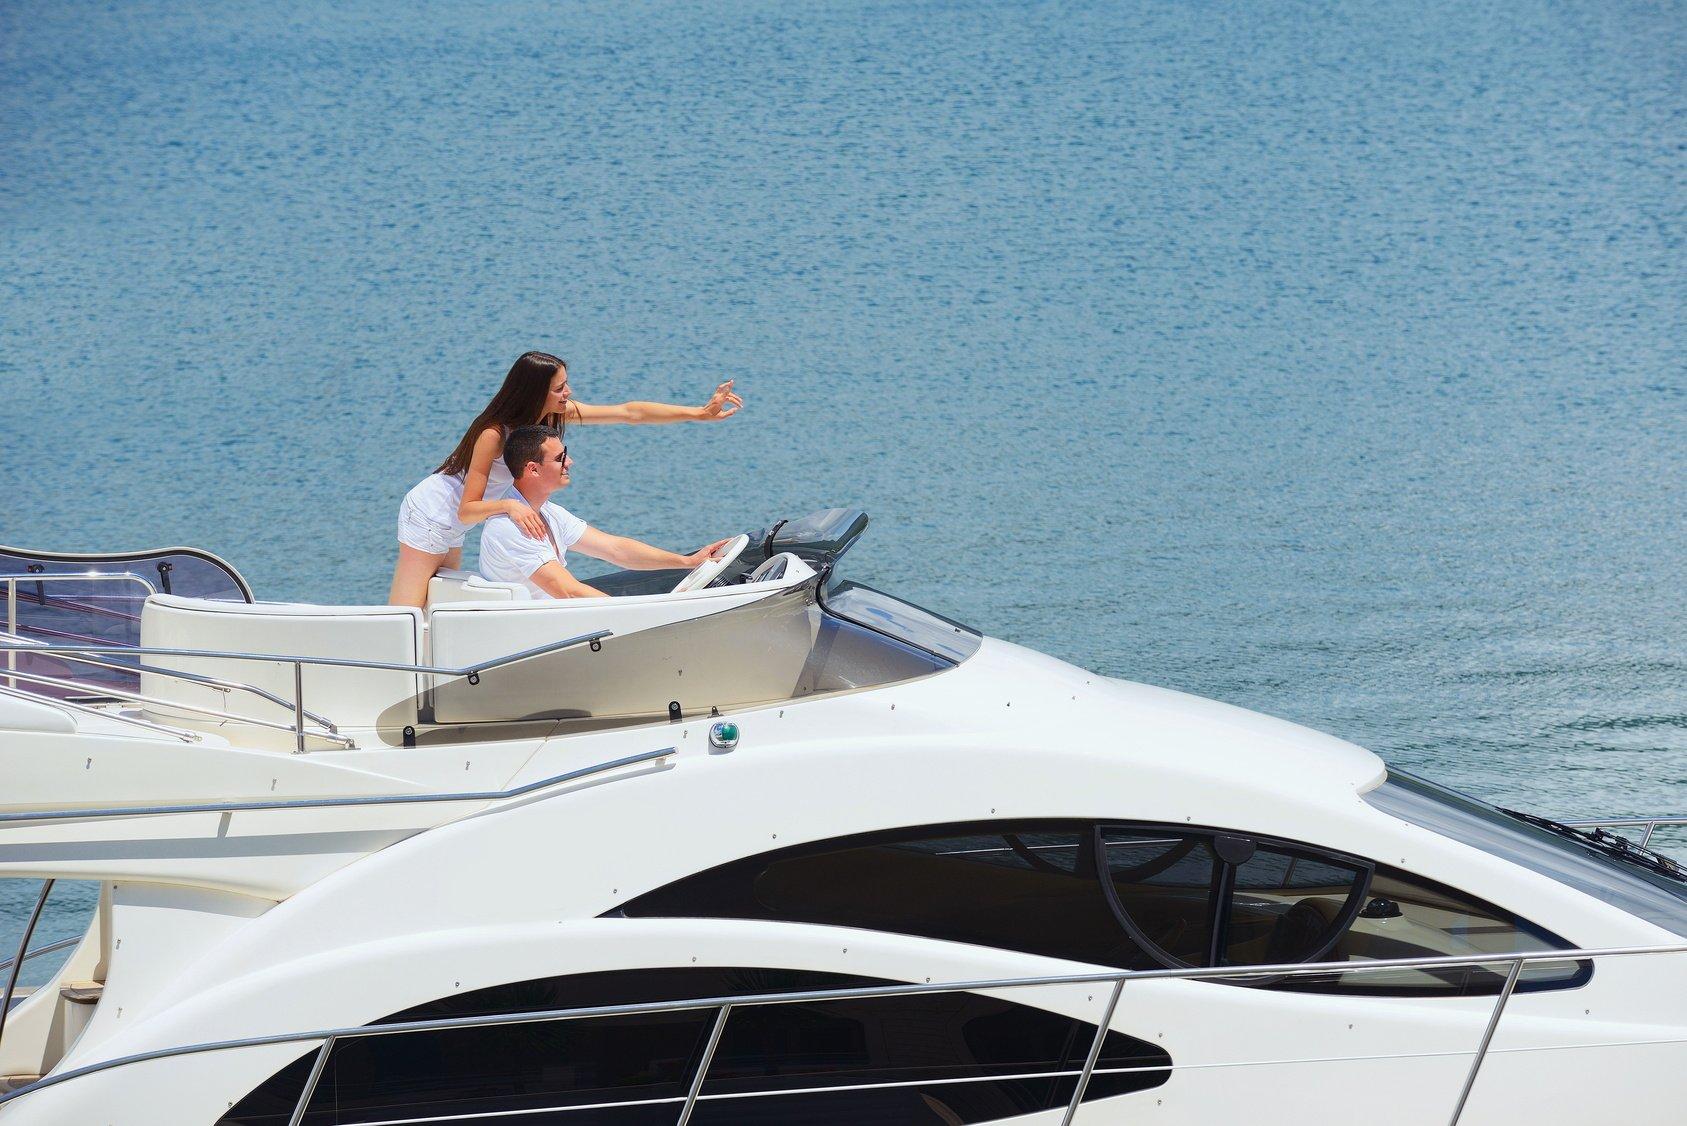 procida-rent-a-boat-charter-favignana-view